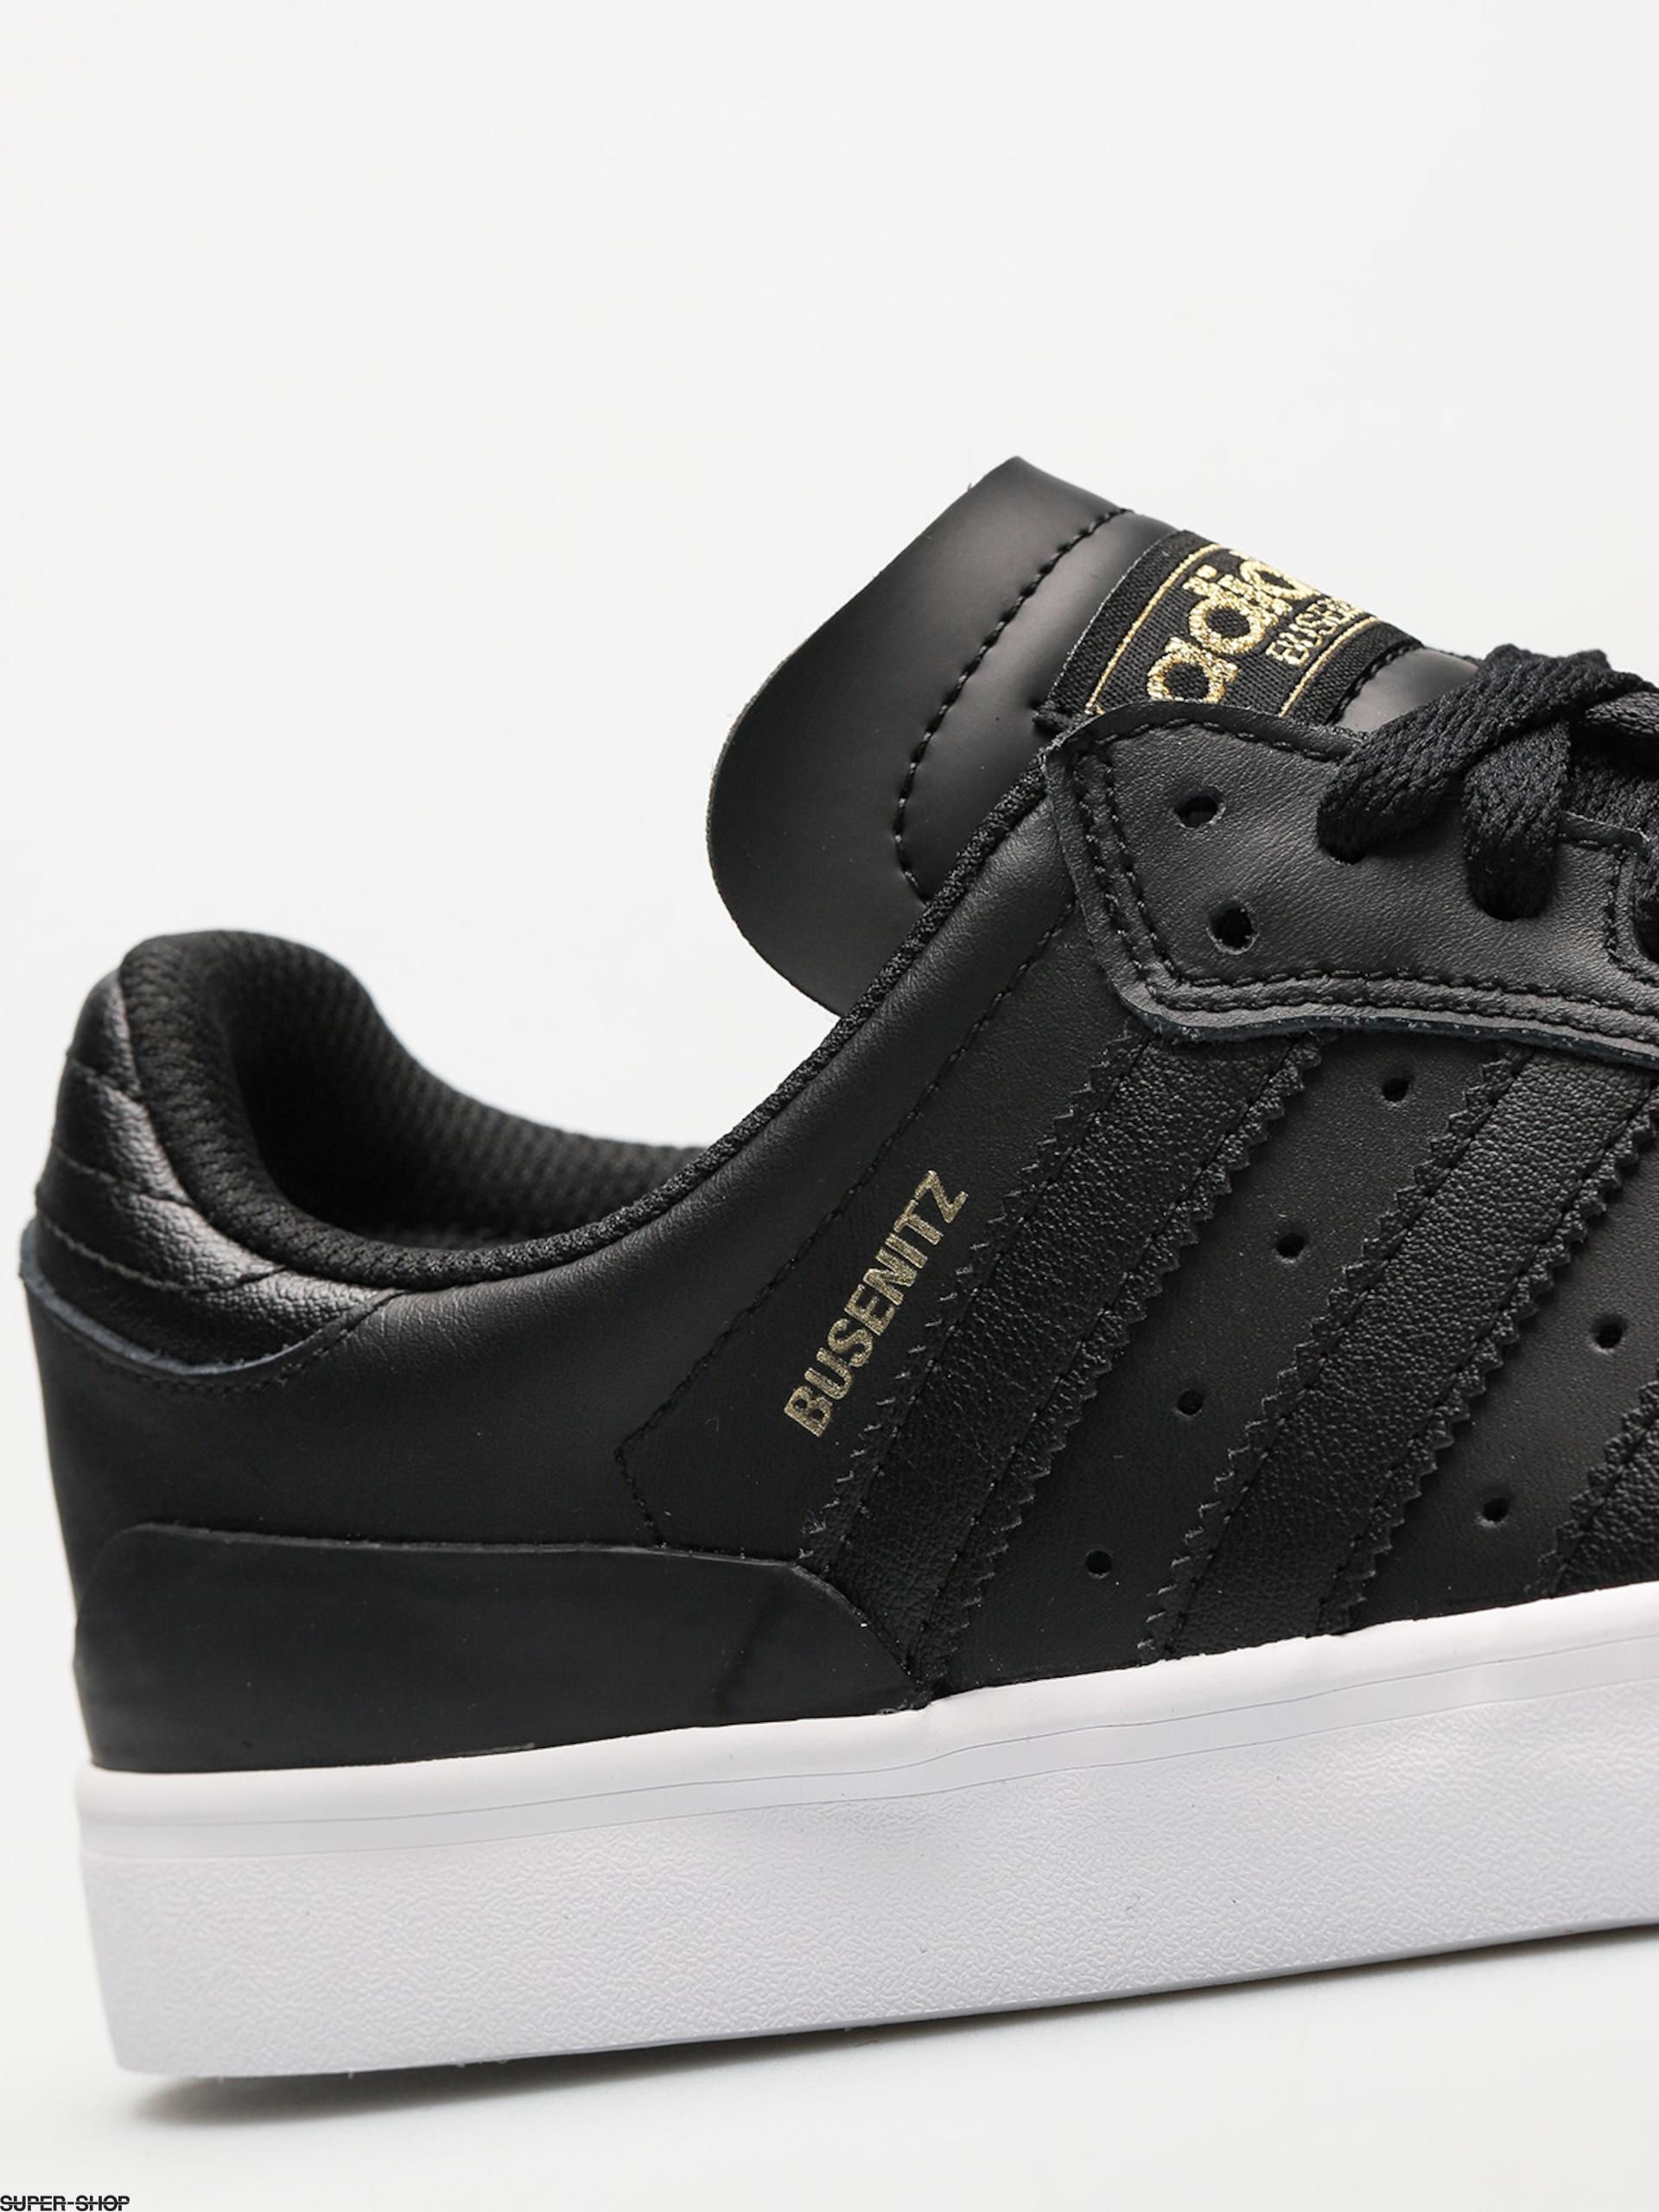 timeless design 6862b 1654d adidas Shoes Busenitz Vulc Rx (core blackcore blackftwr whit